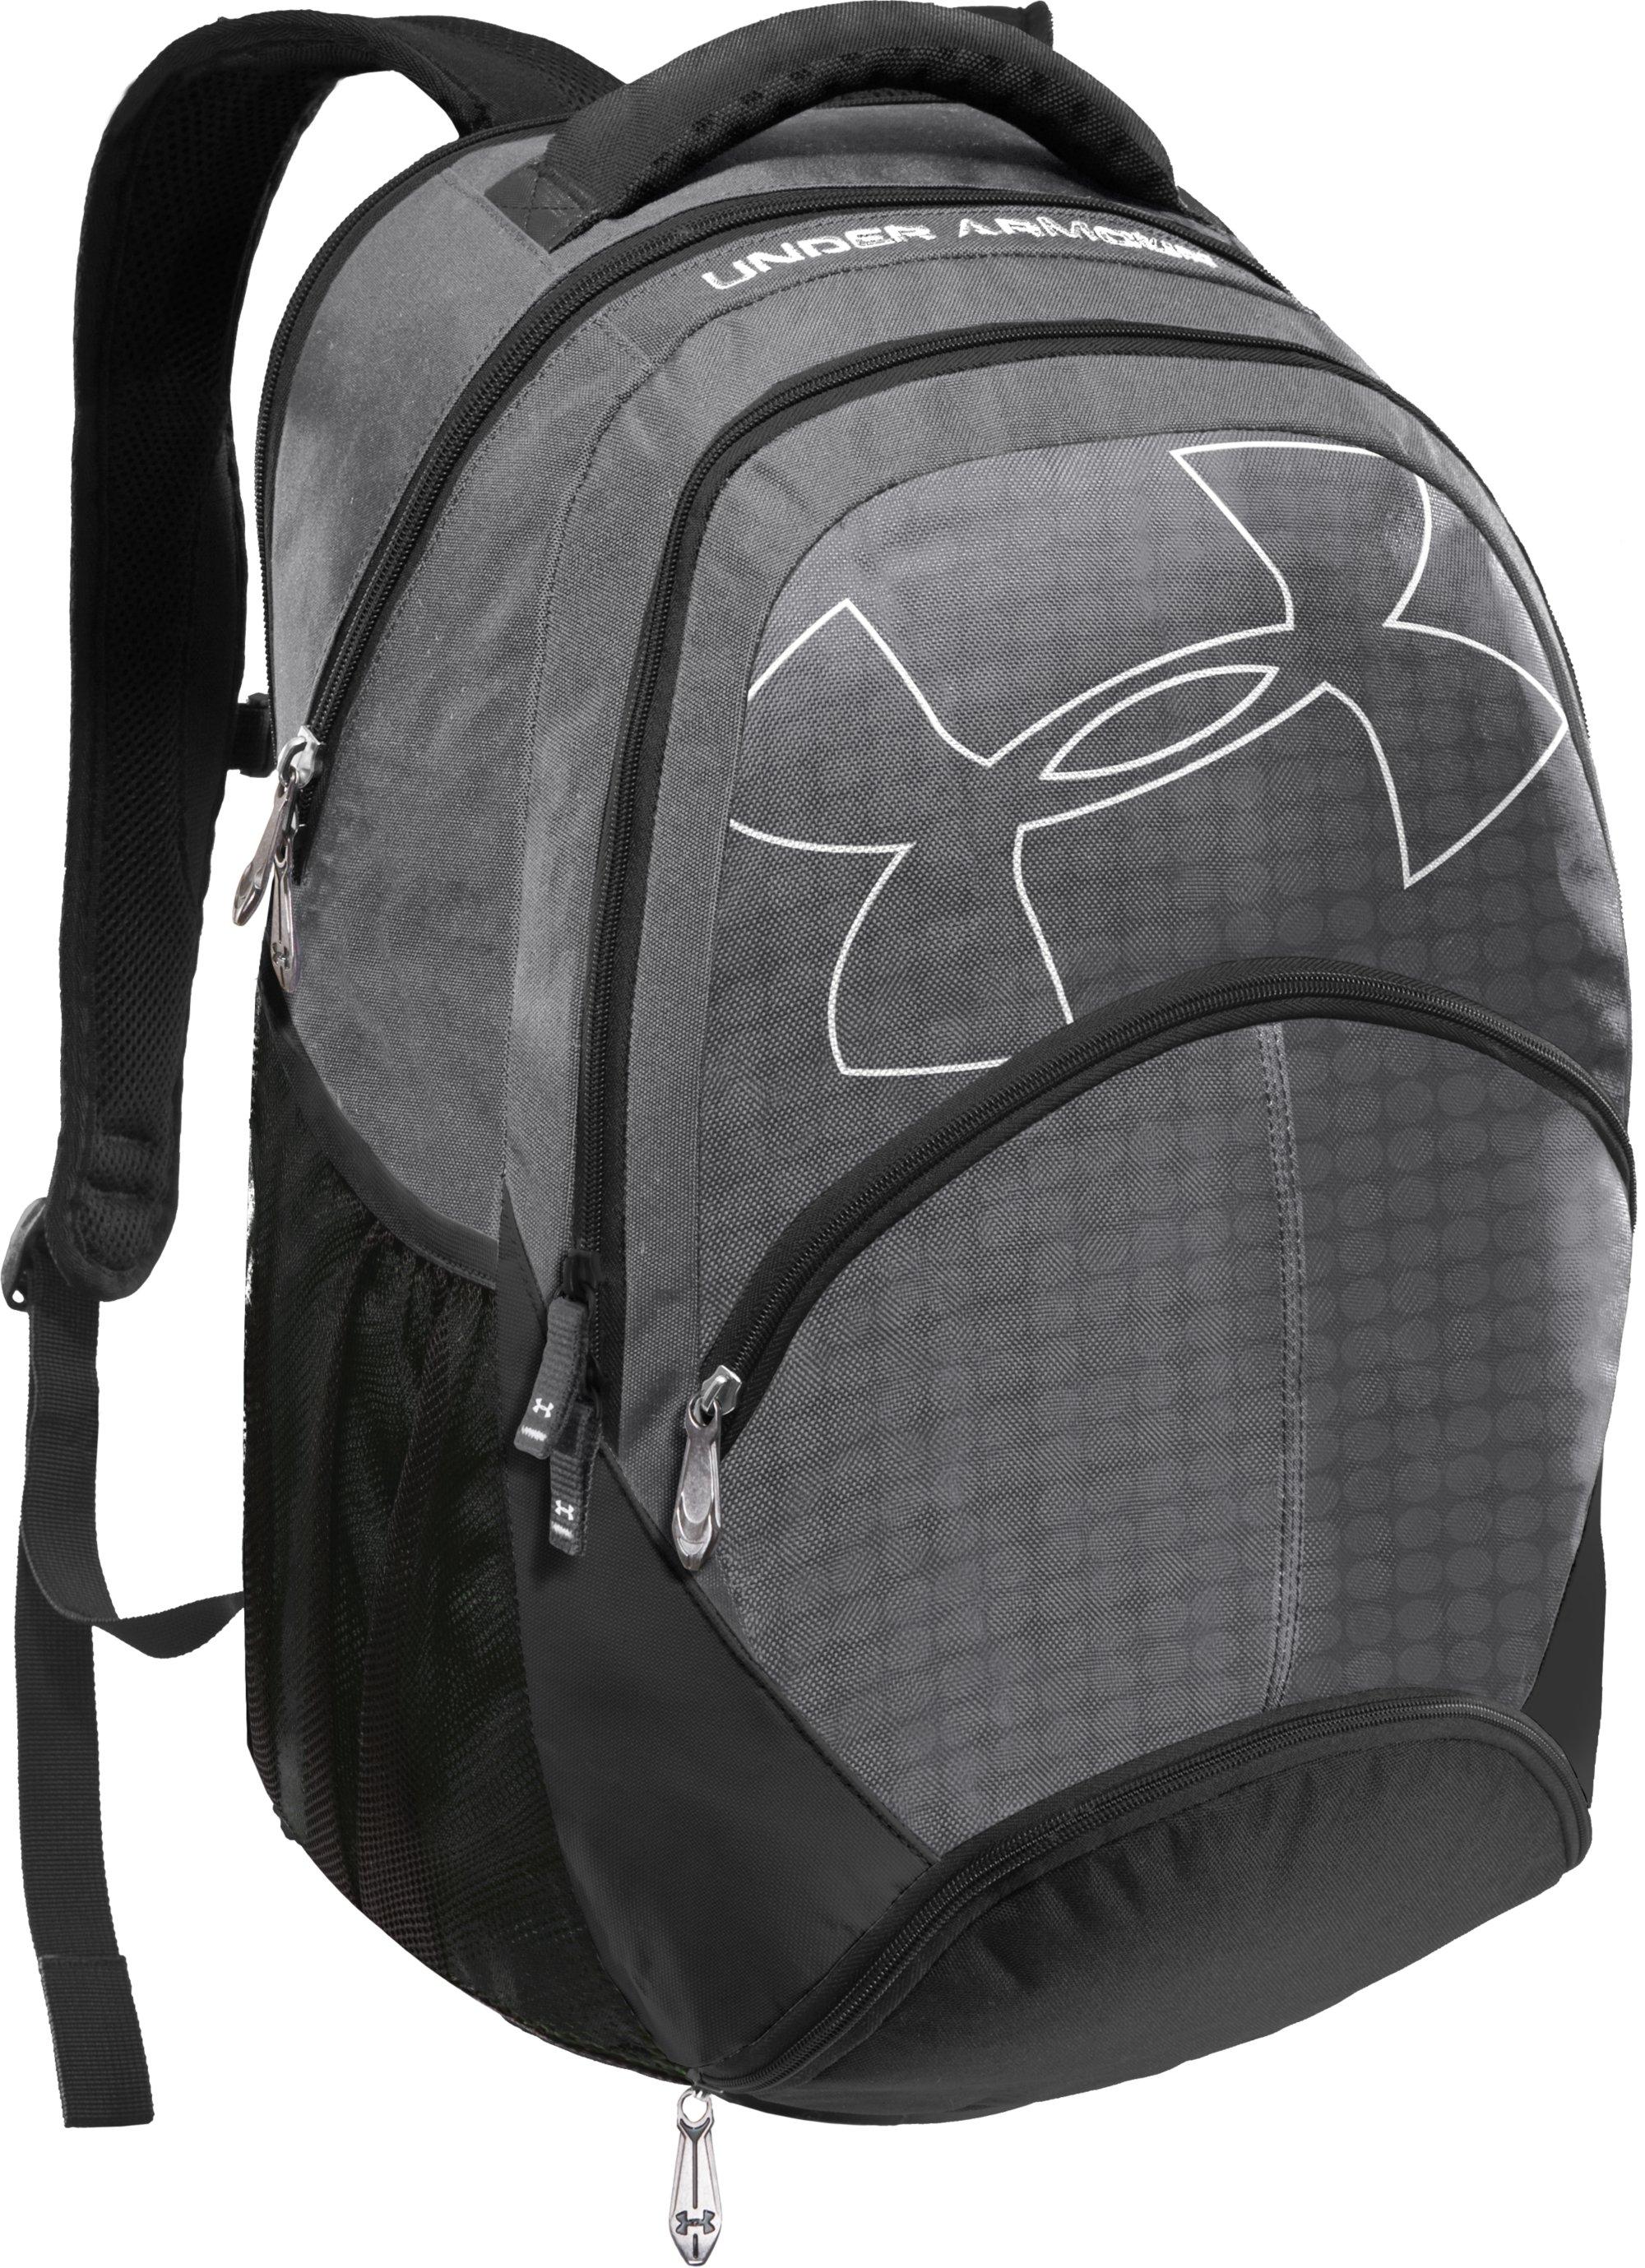 Biggest School Backpack - Crazy Backpacks